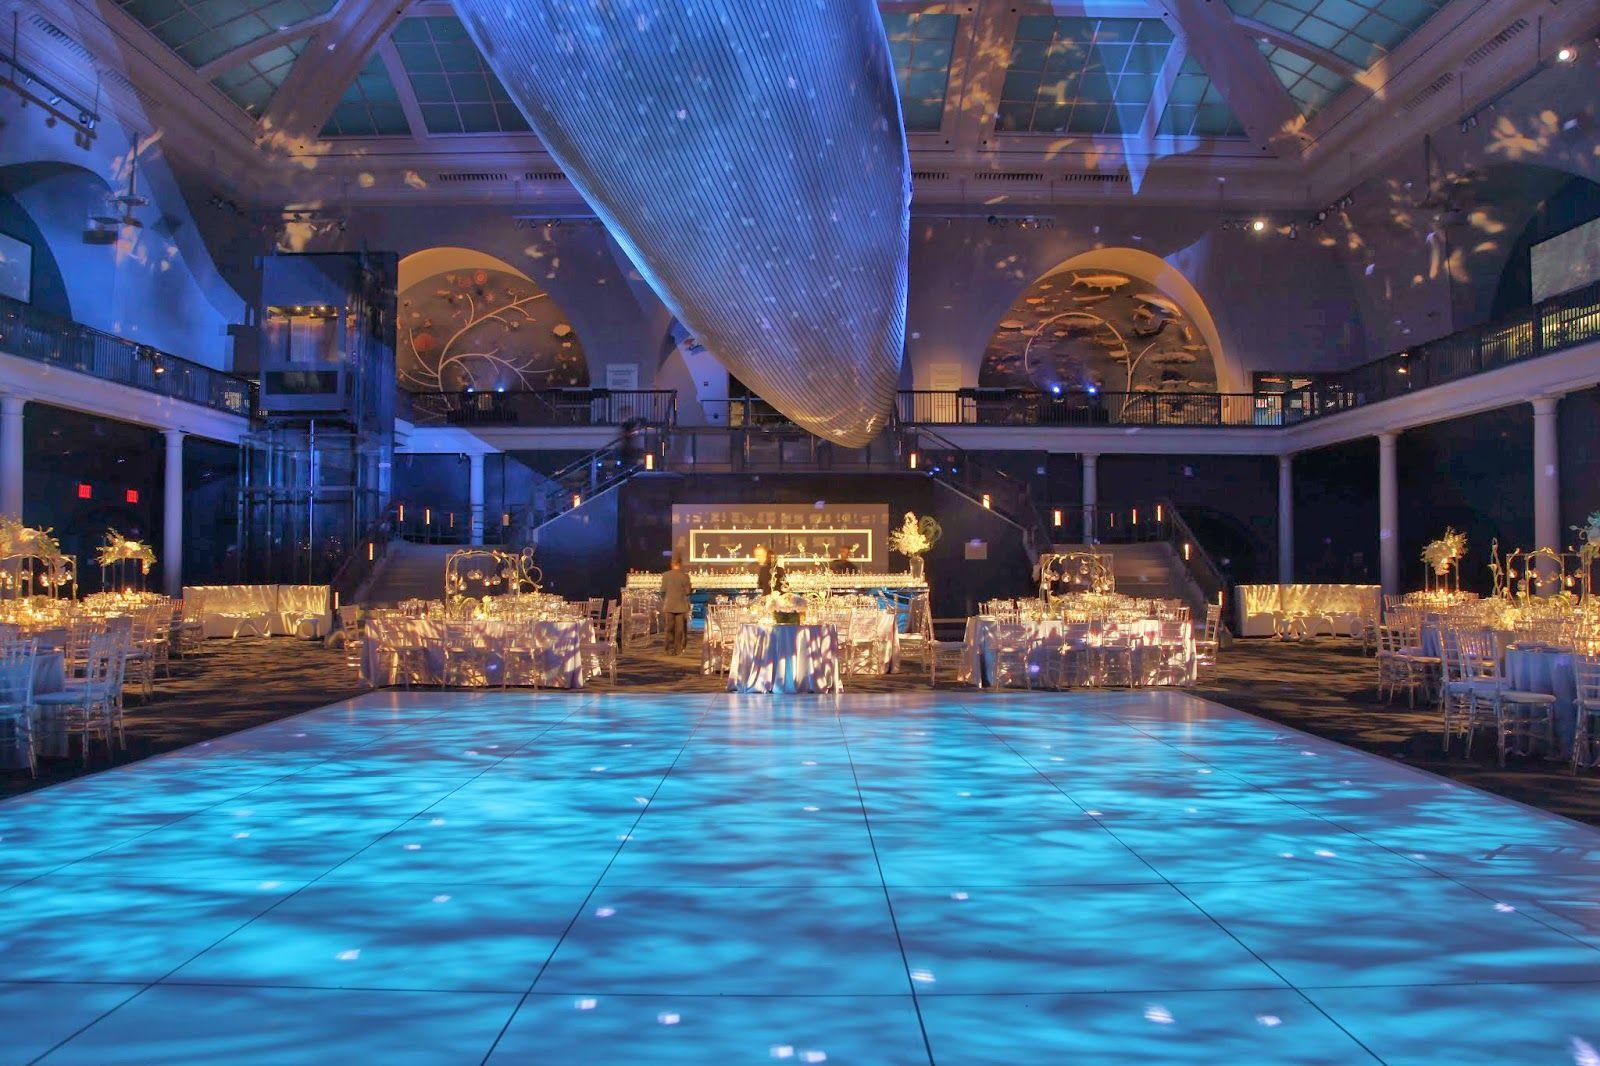 under the sea wedding - Google Search … | Pinteres…